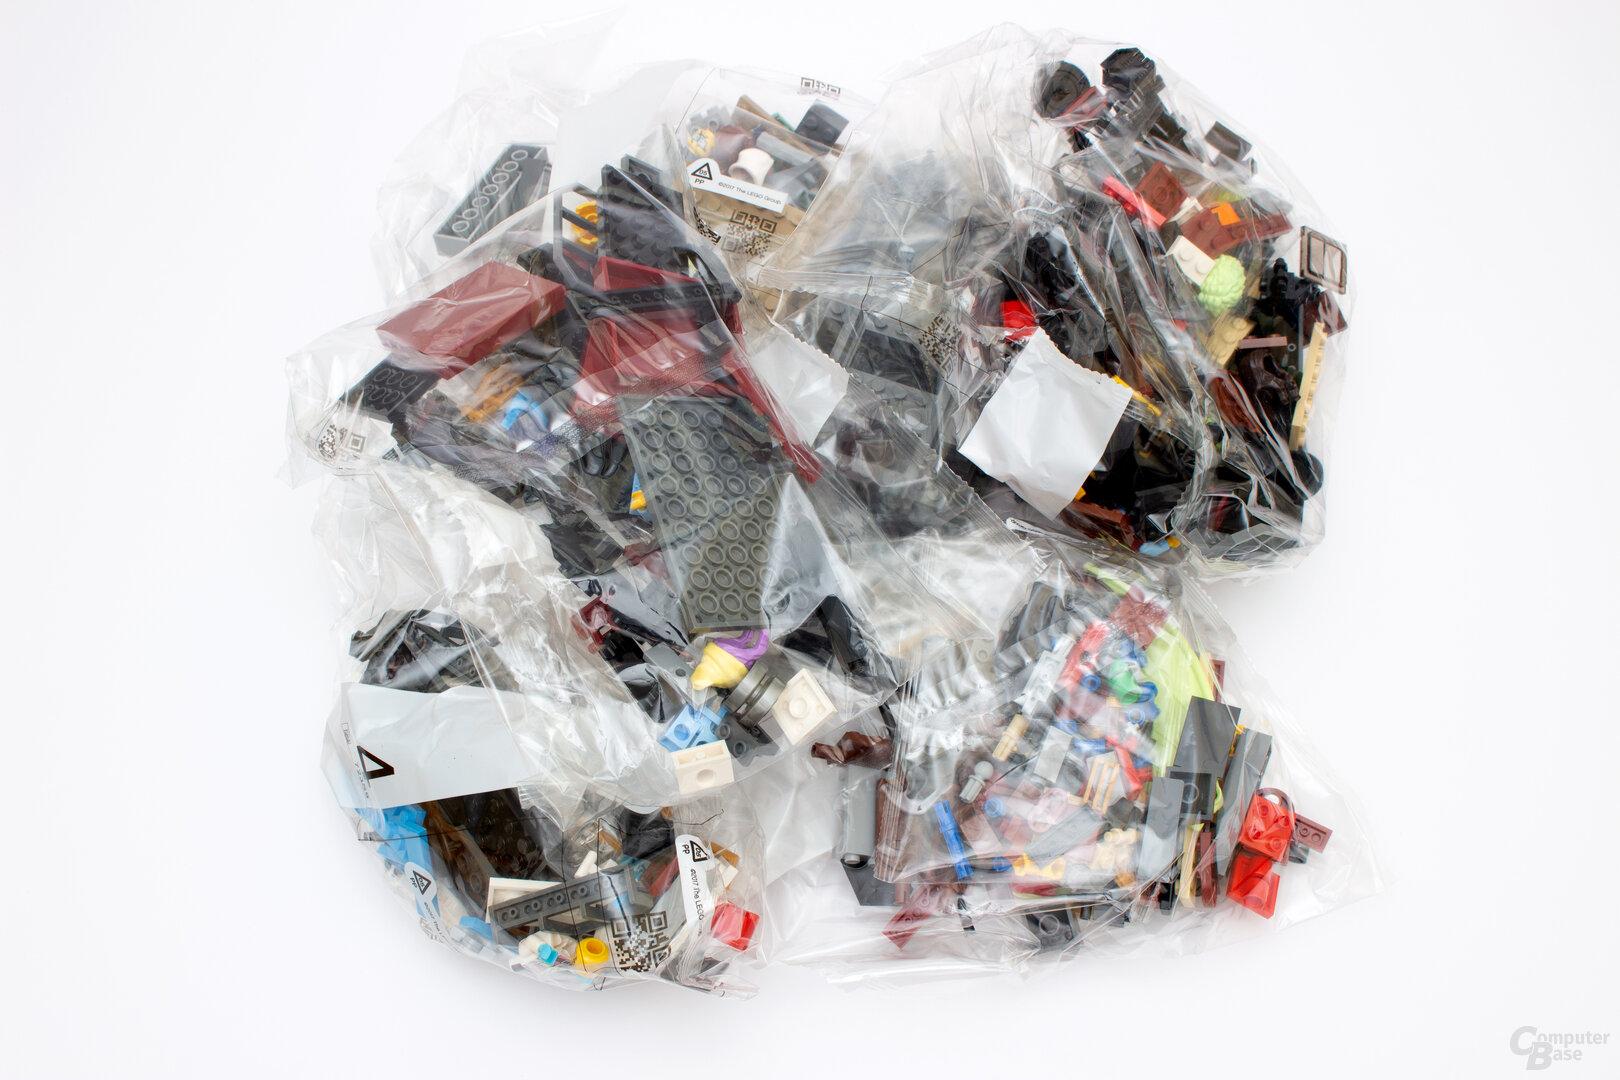 Viele Tüten bedeuten viel Abfall